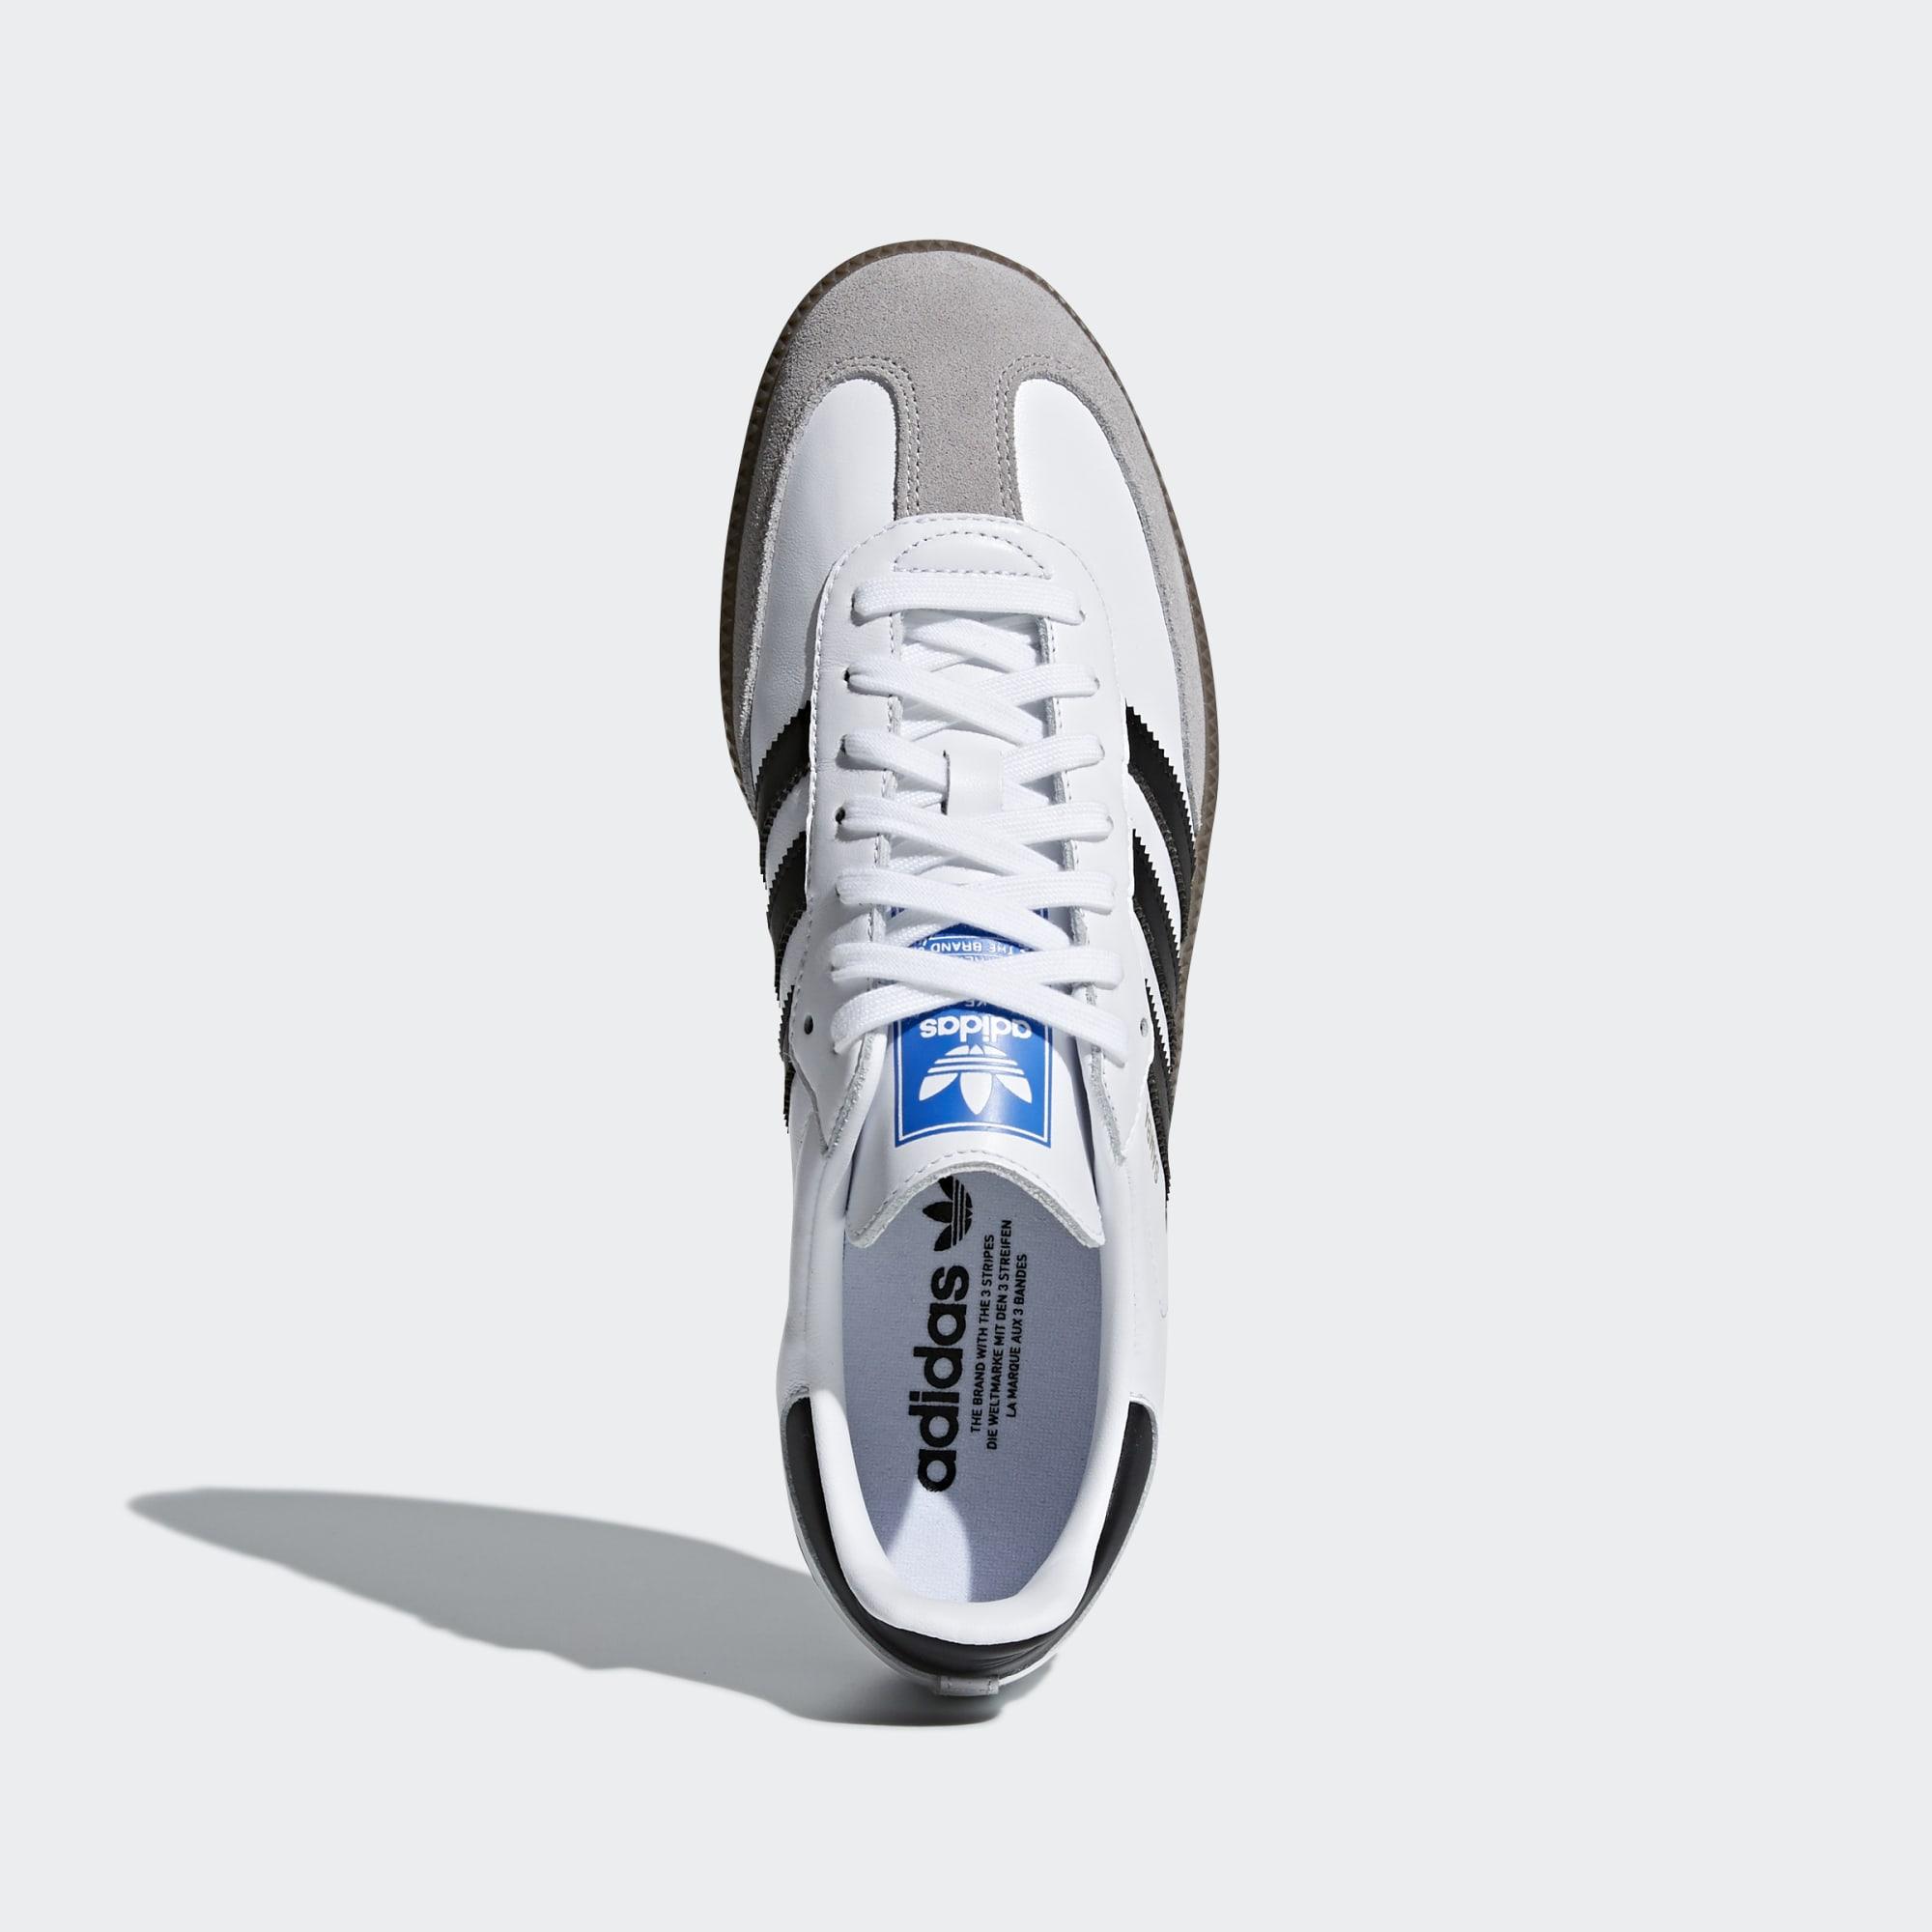 4. kép: ADIDAS sneaker